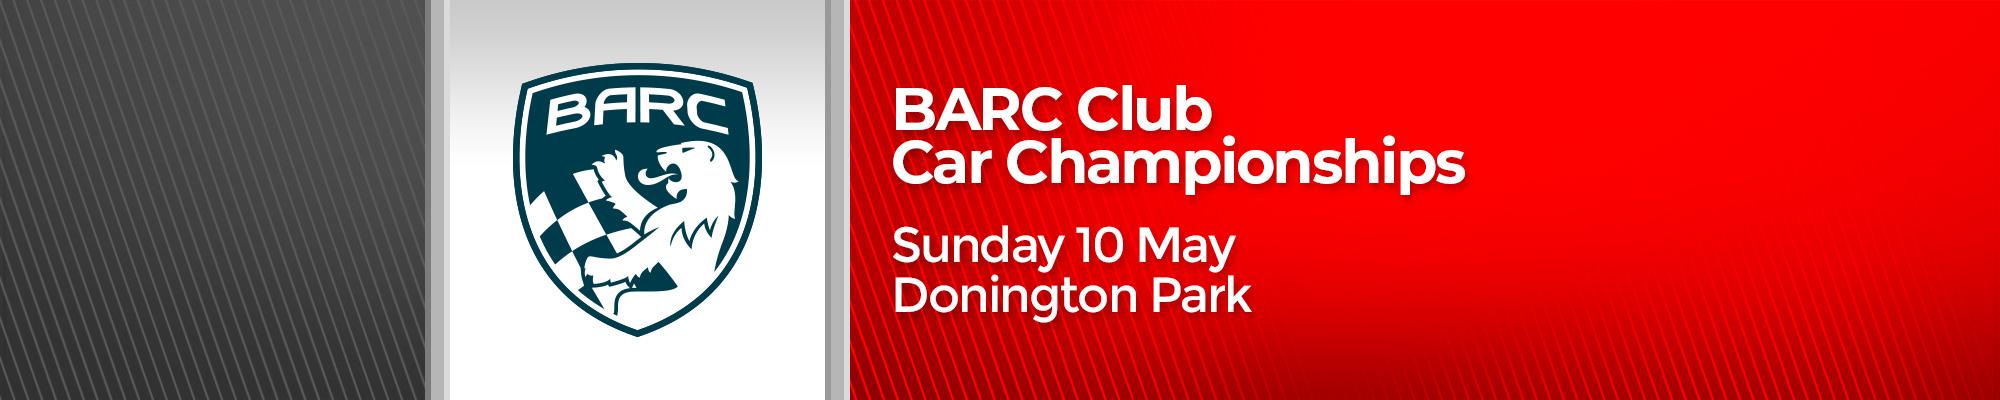 BARC Club Car Championships - POSTPONED